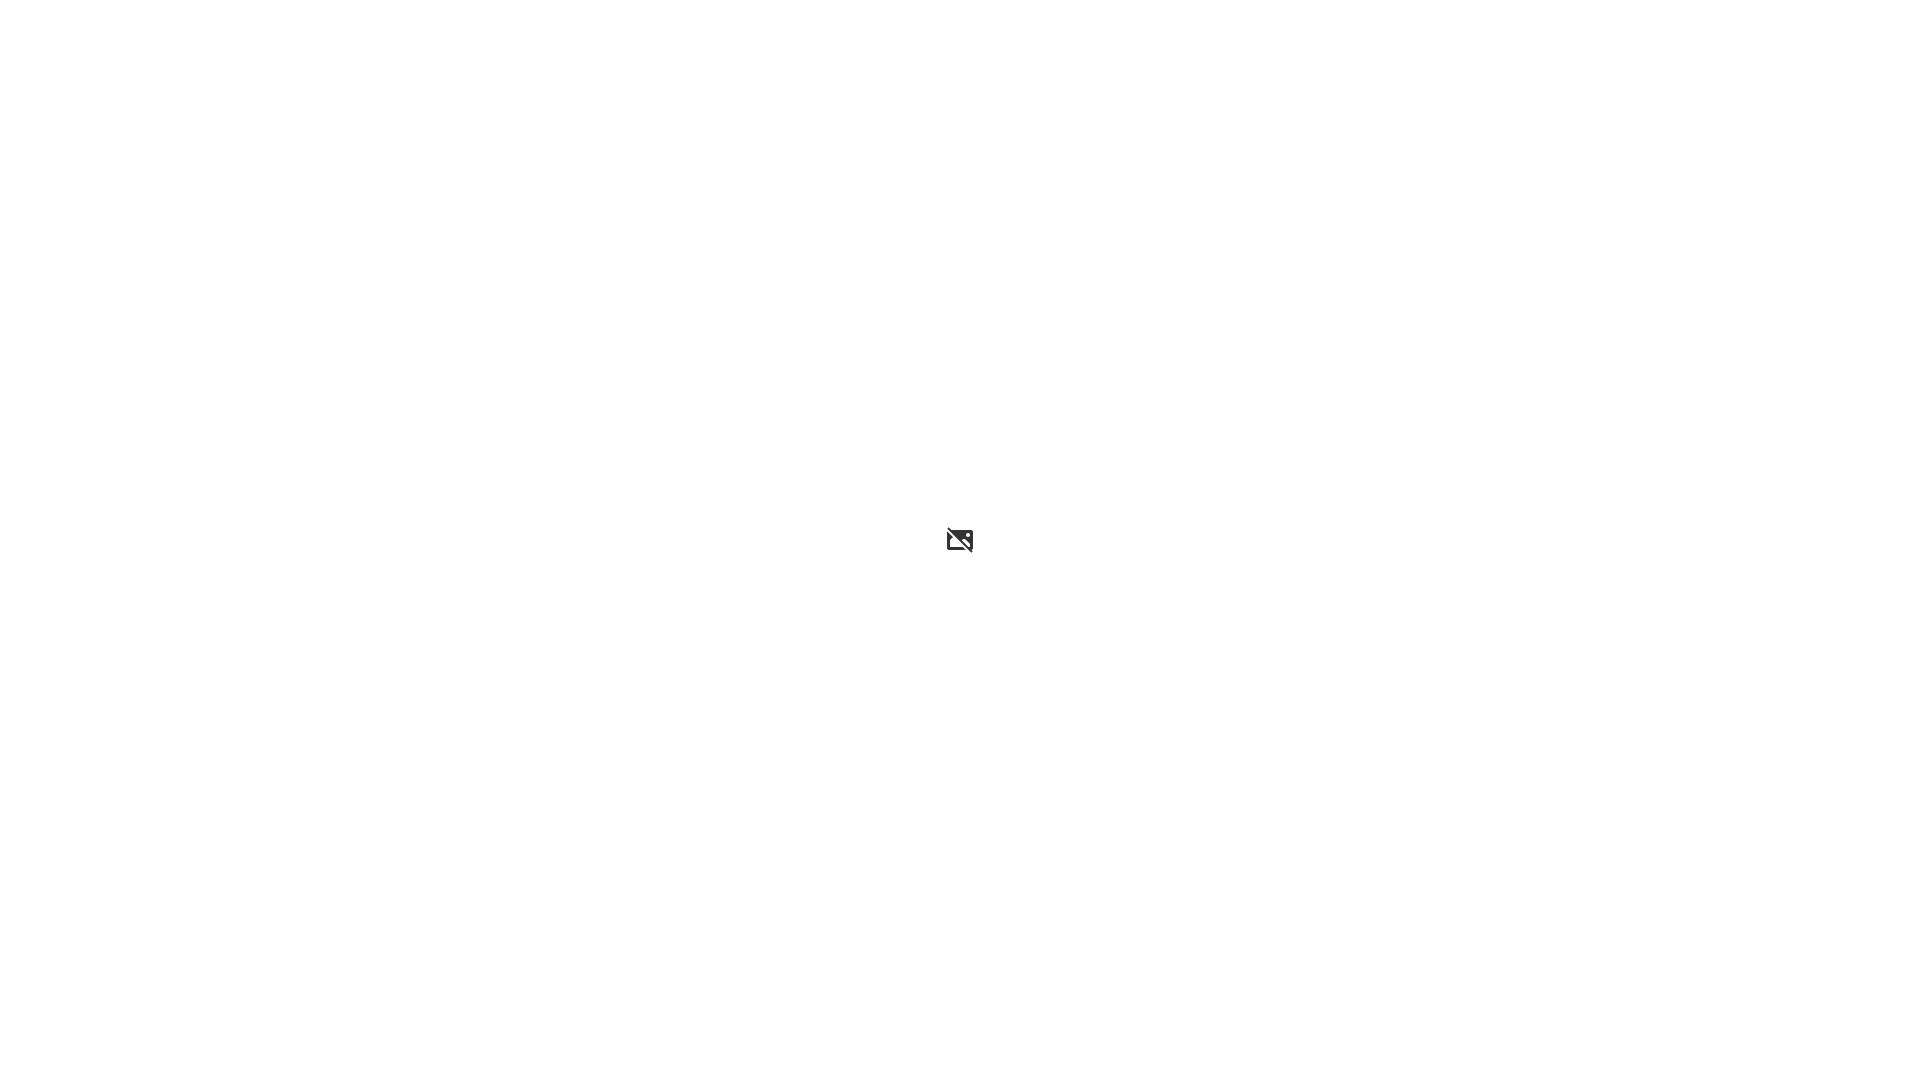 lunar_goddess_diana___custom_wallpaper___by_hit3n_by_xmarquinhos-d71ya7i